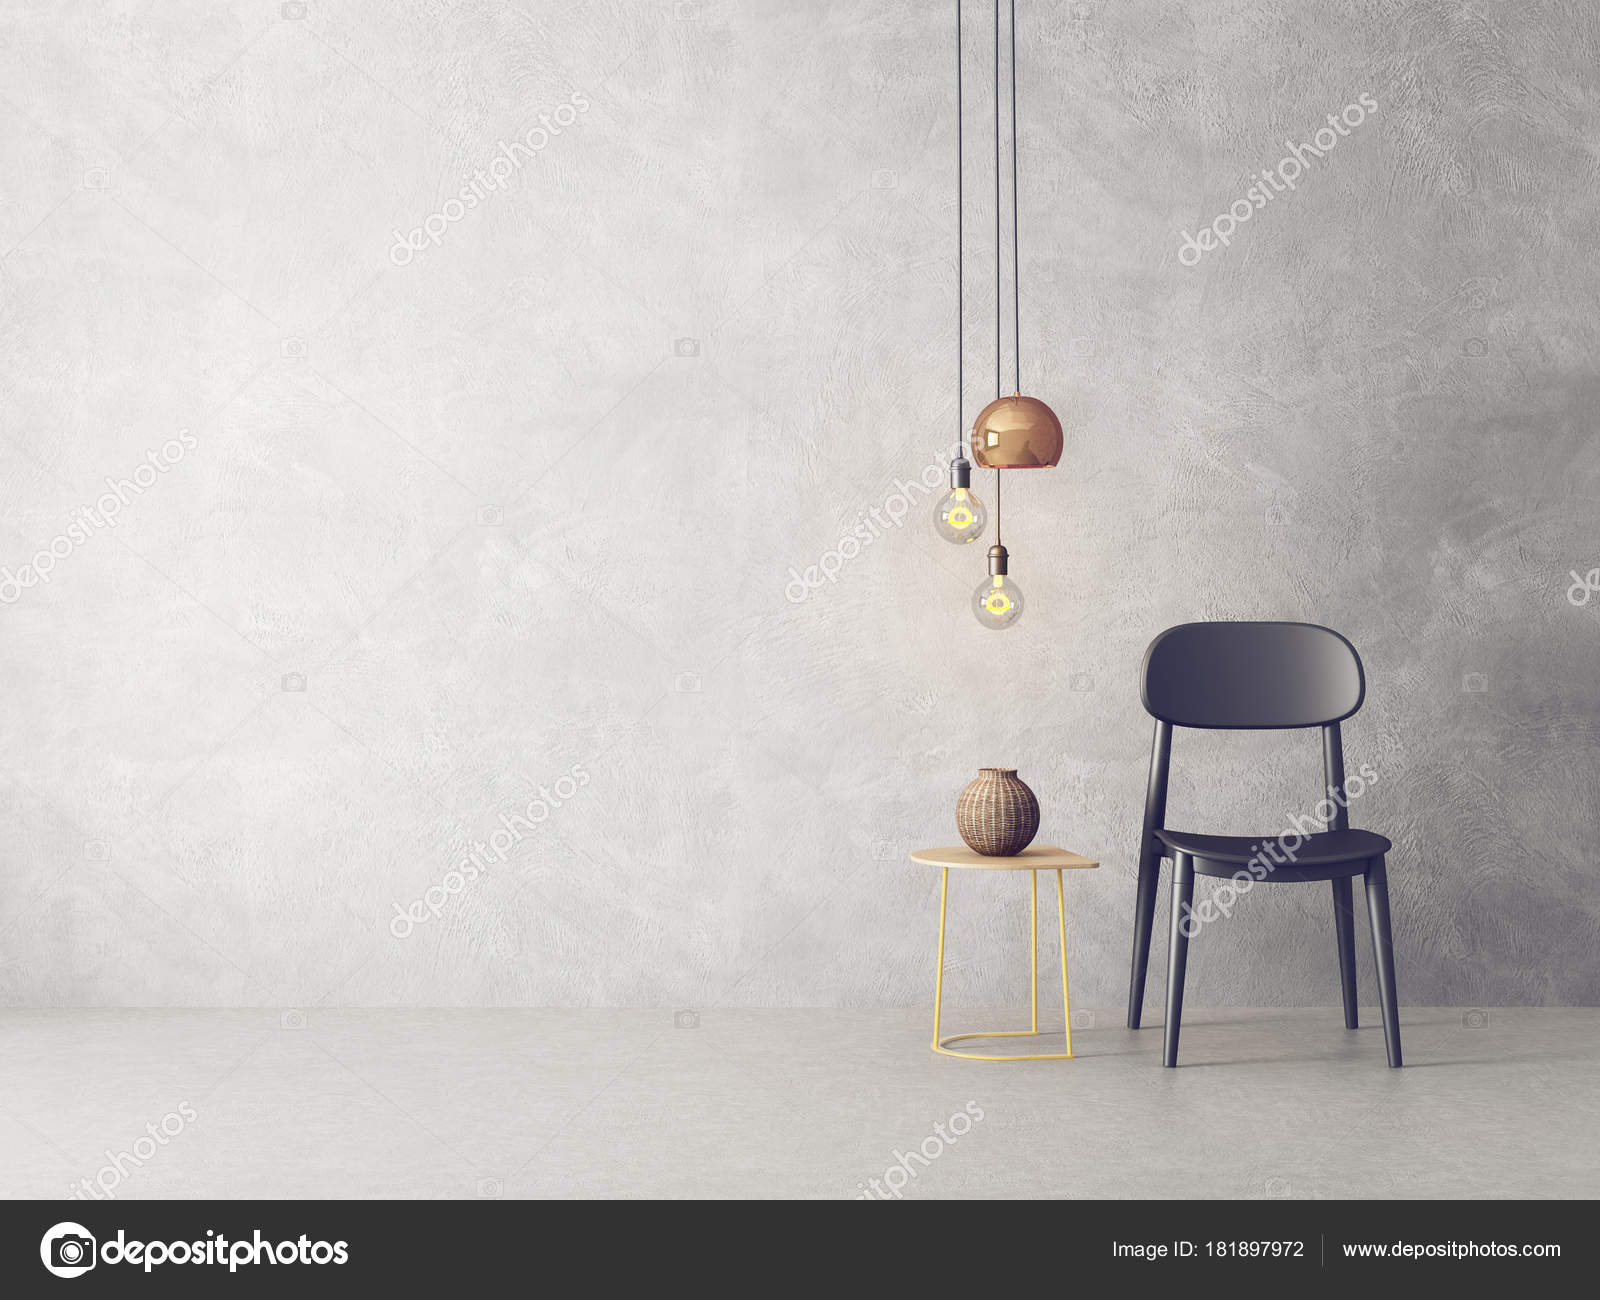 Modern Living Room Black Chair Hanging Lamps Vase Table Scandinavian ...